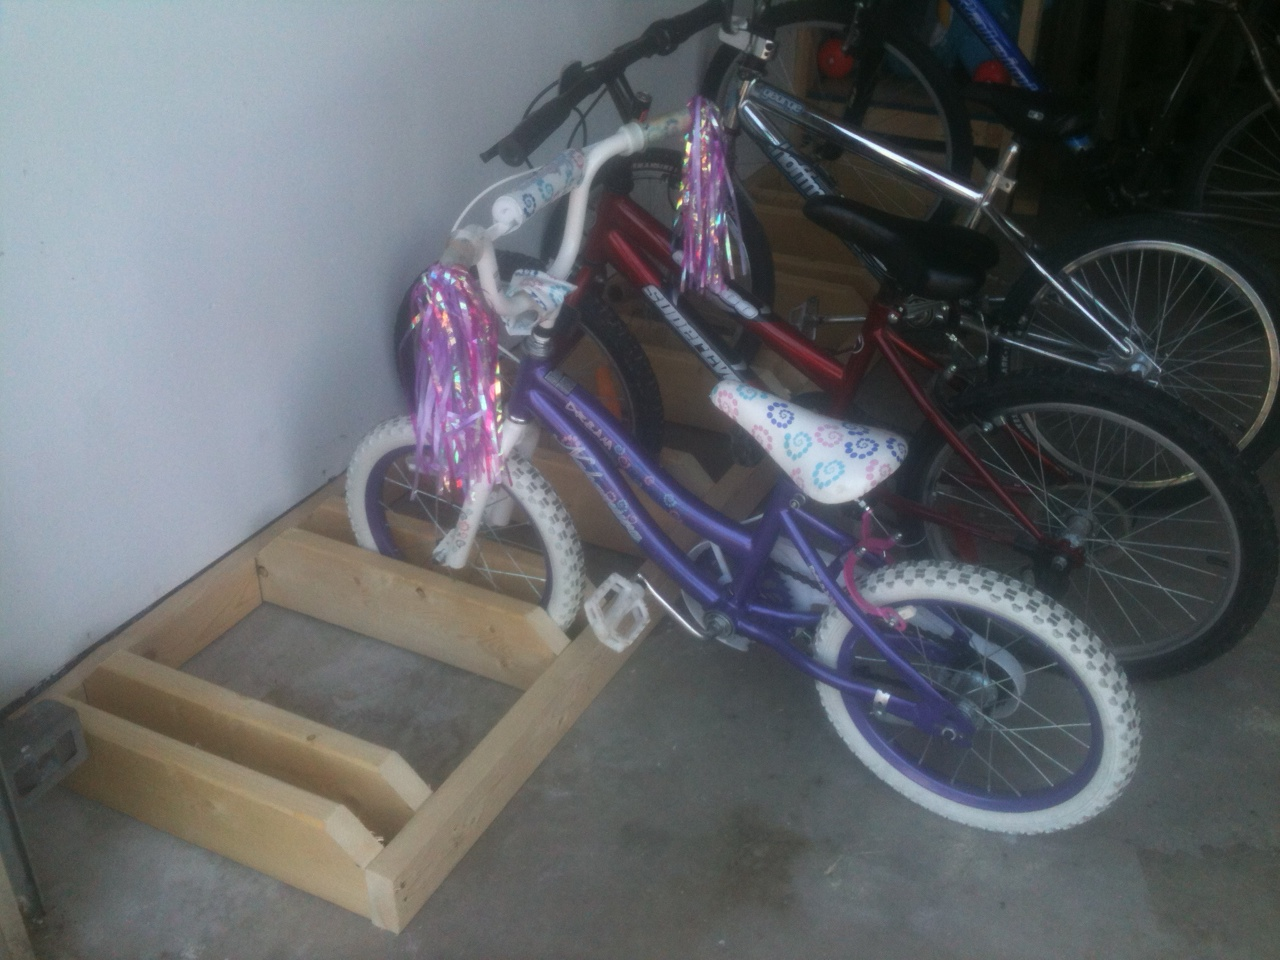 Buy A House Create A Home Diy Bike Rack And Organization